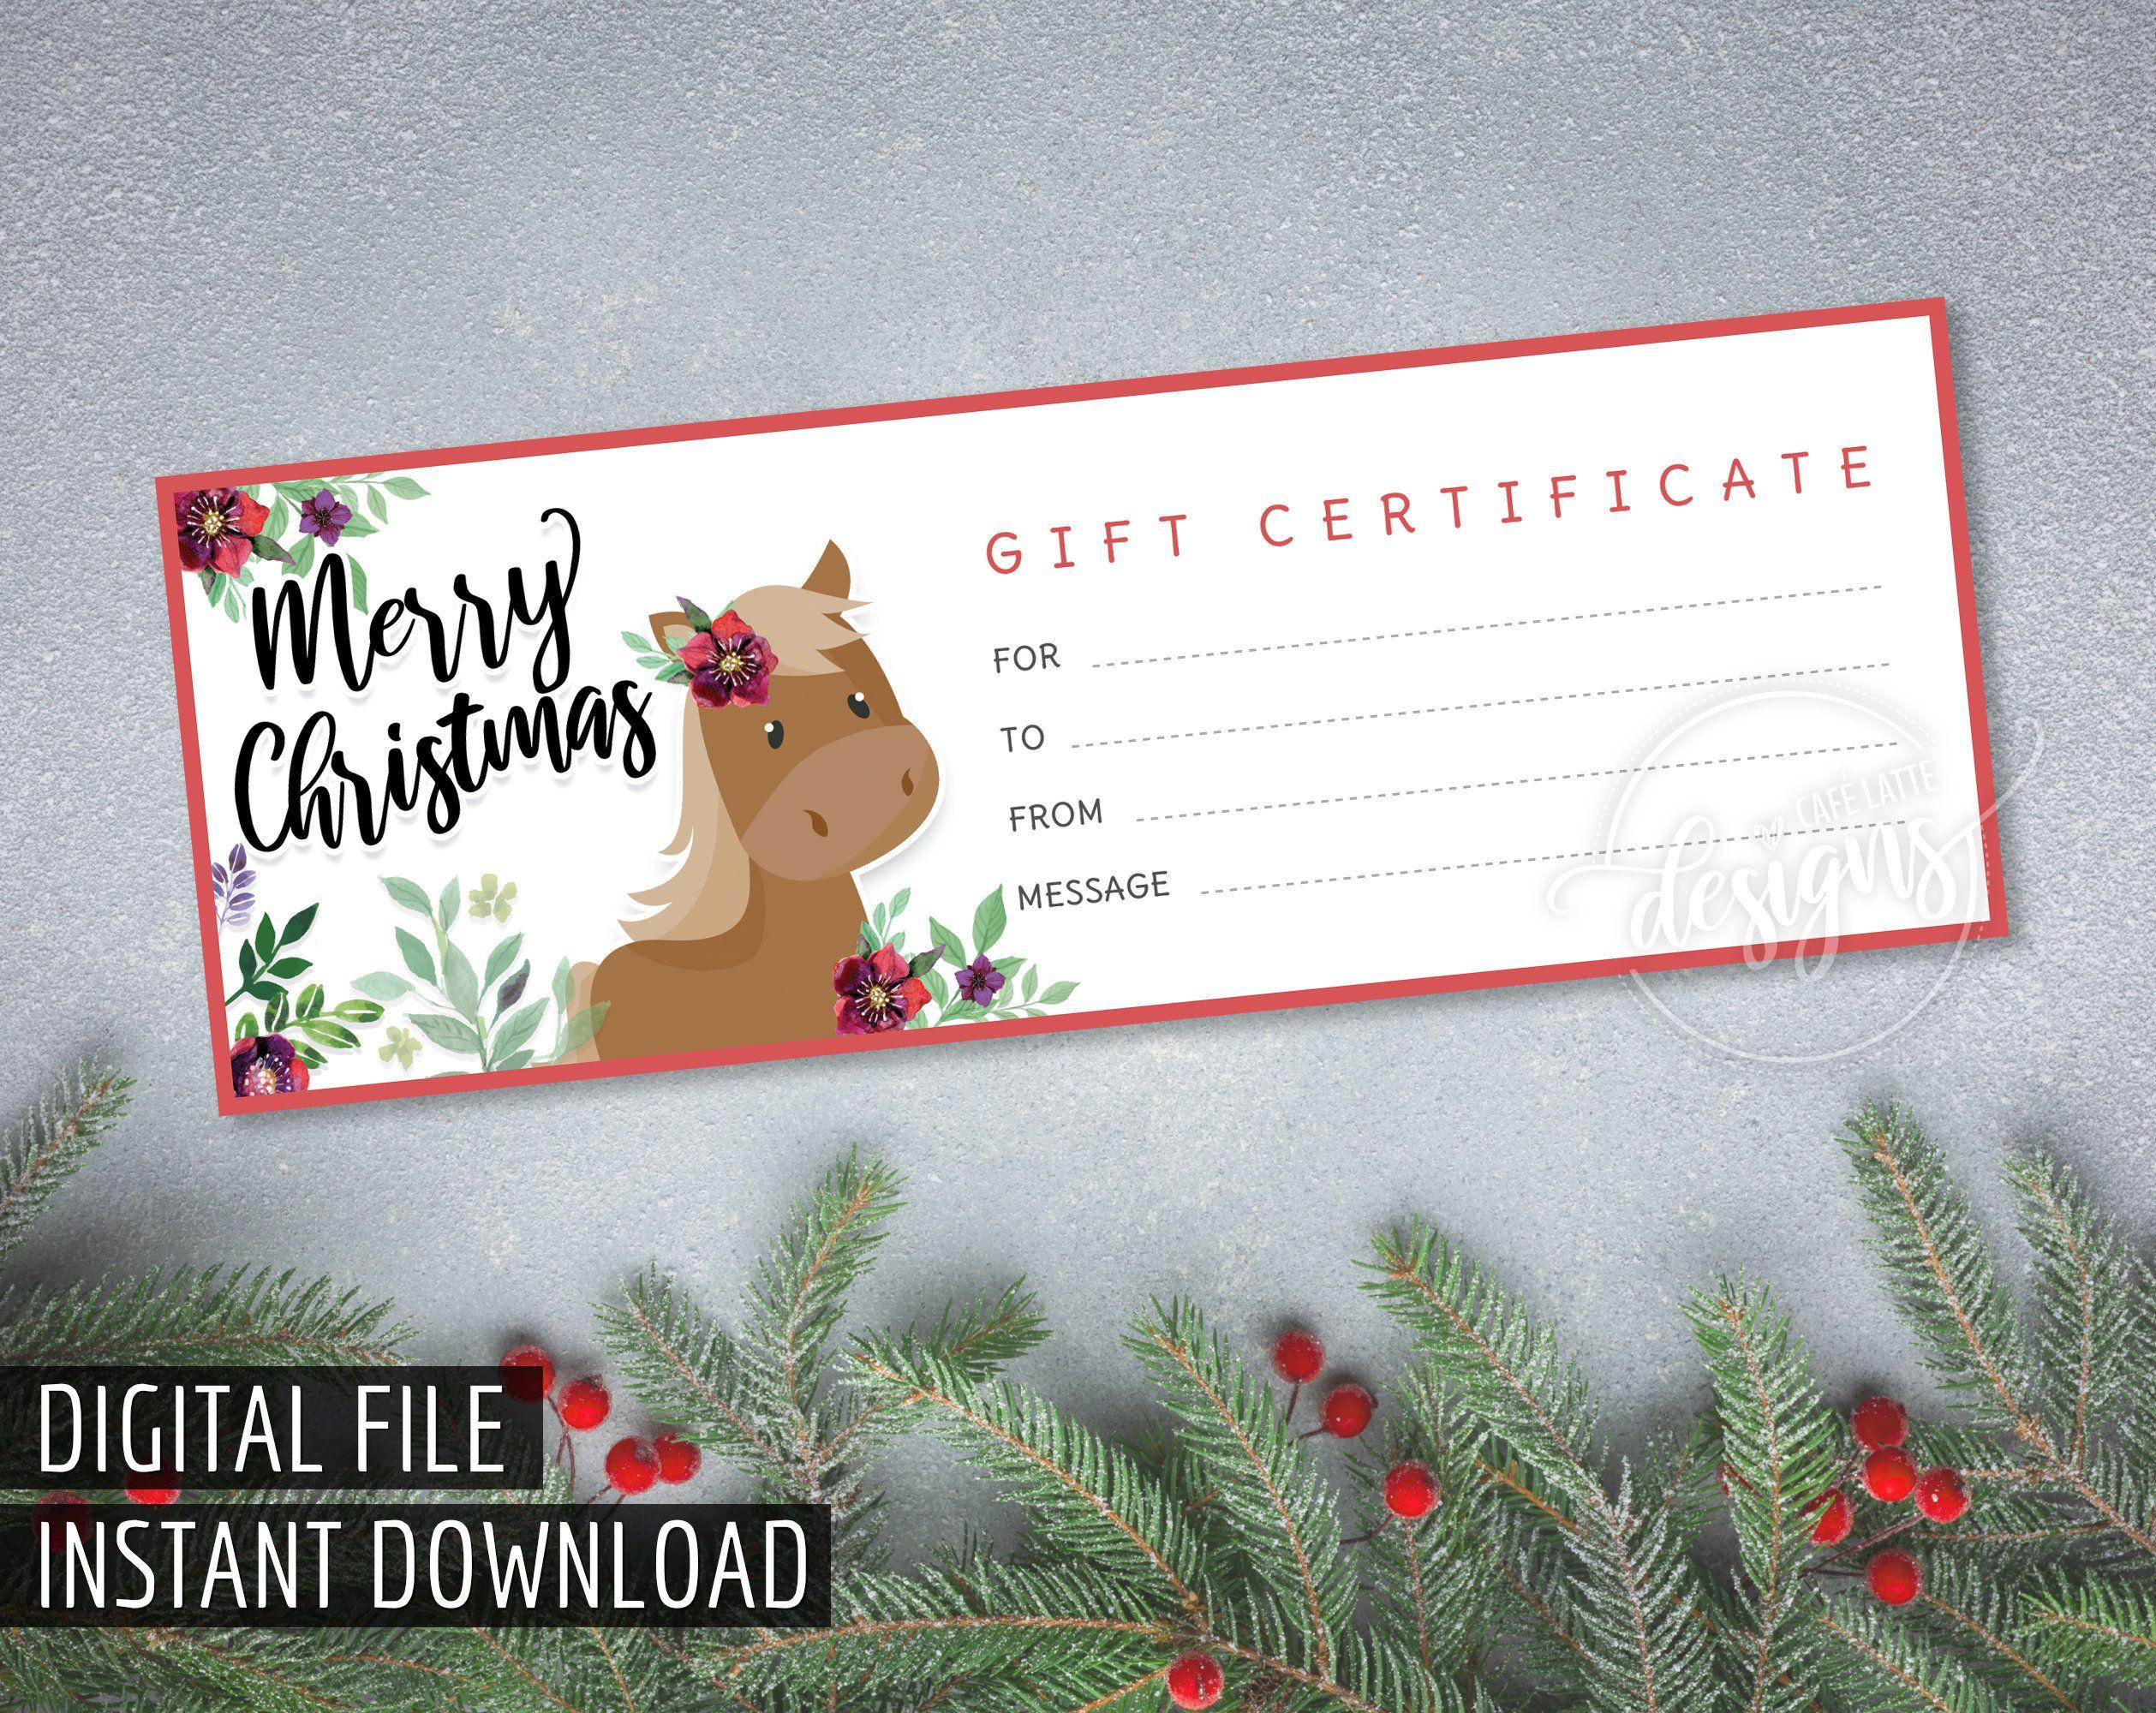 Horseback Riding Gift Certificate Template Elegant 25 4x9 Cute Rustic Blank Gift Cert In 2020 Gift Certificate Template Holiday Gift Certificates Certificate Templates